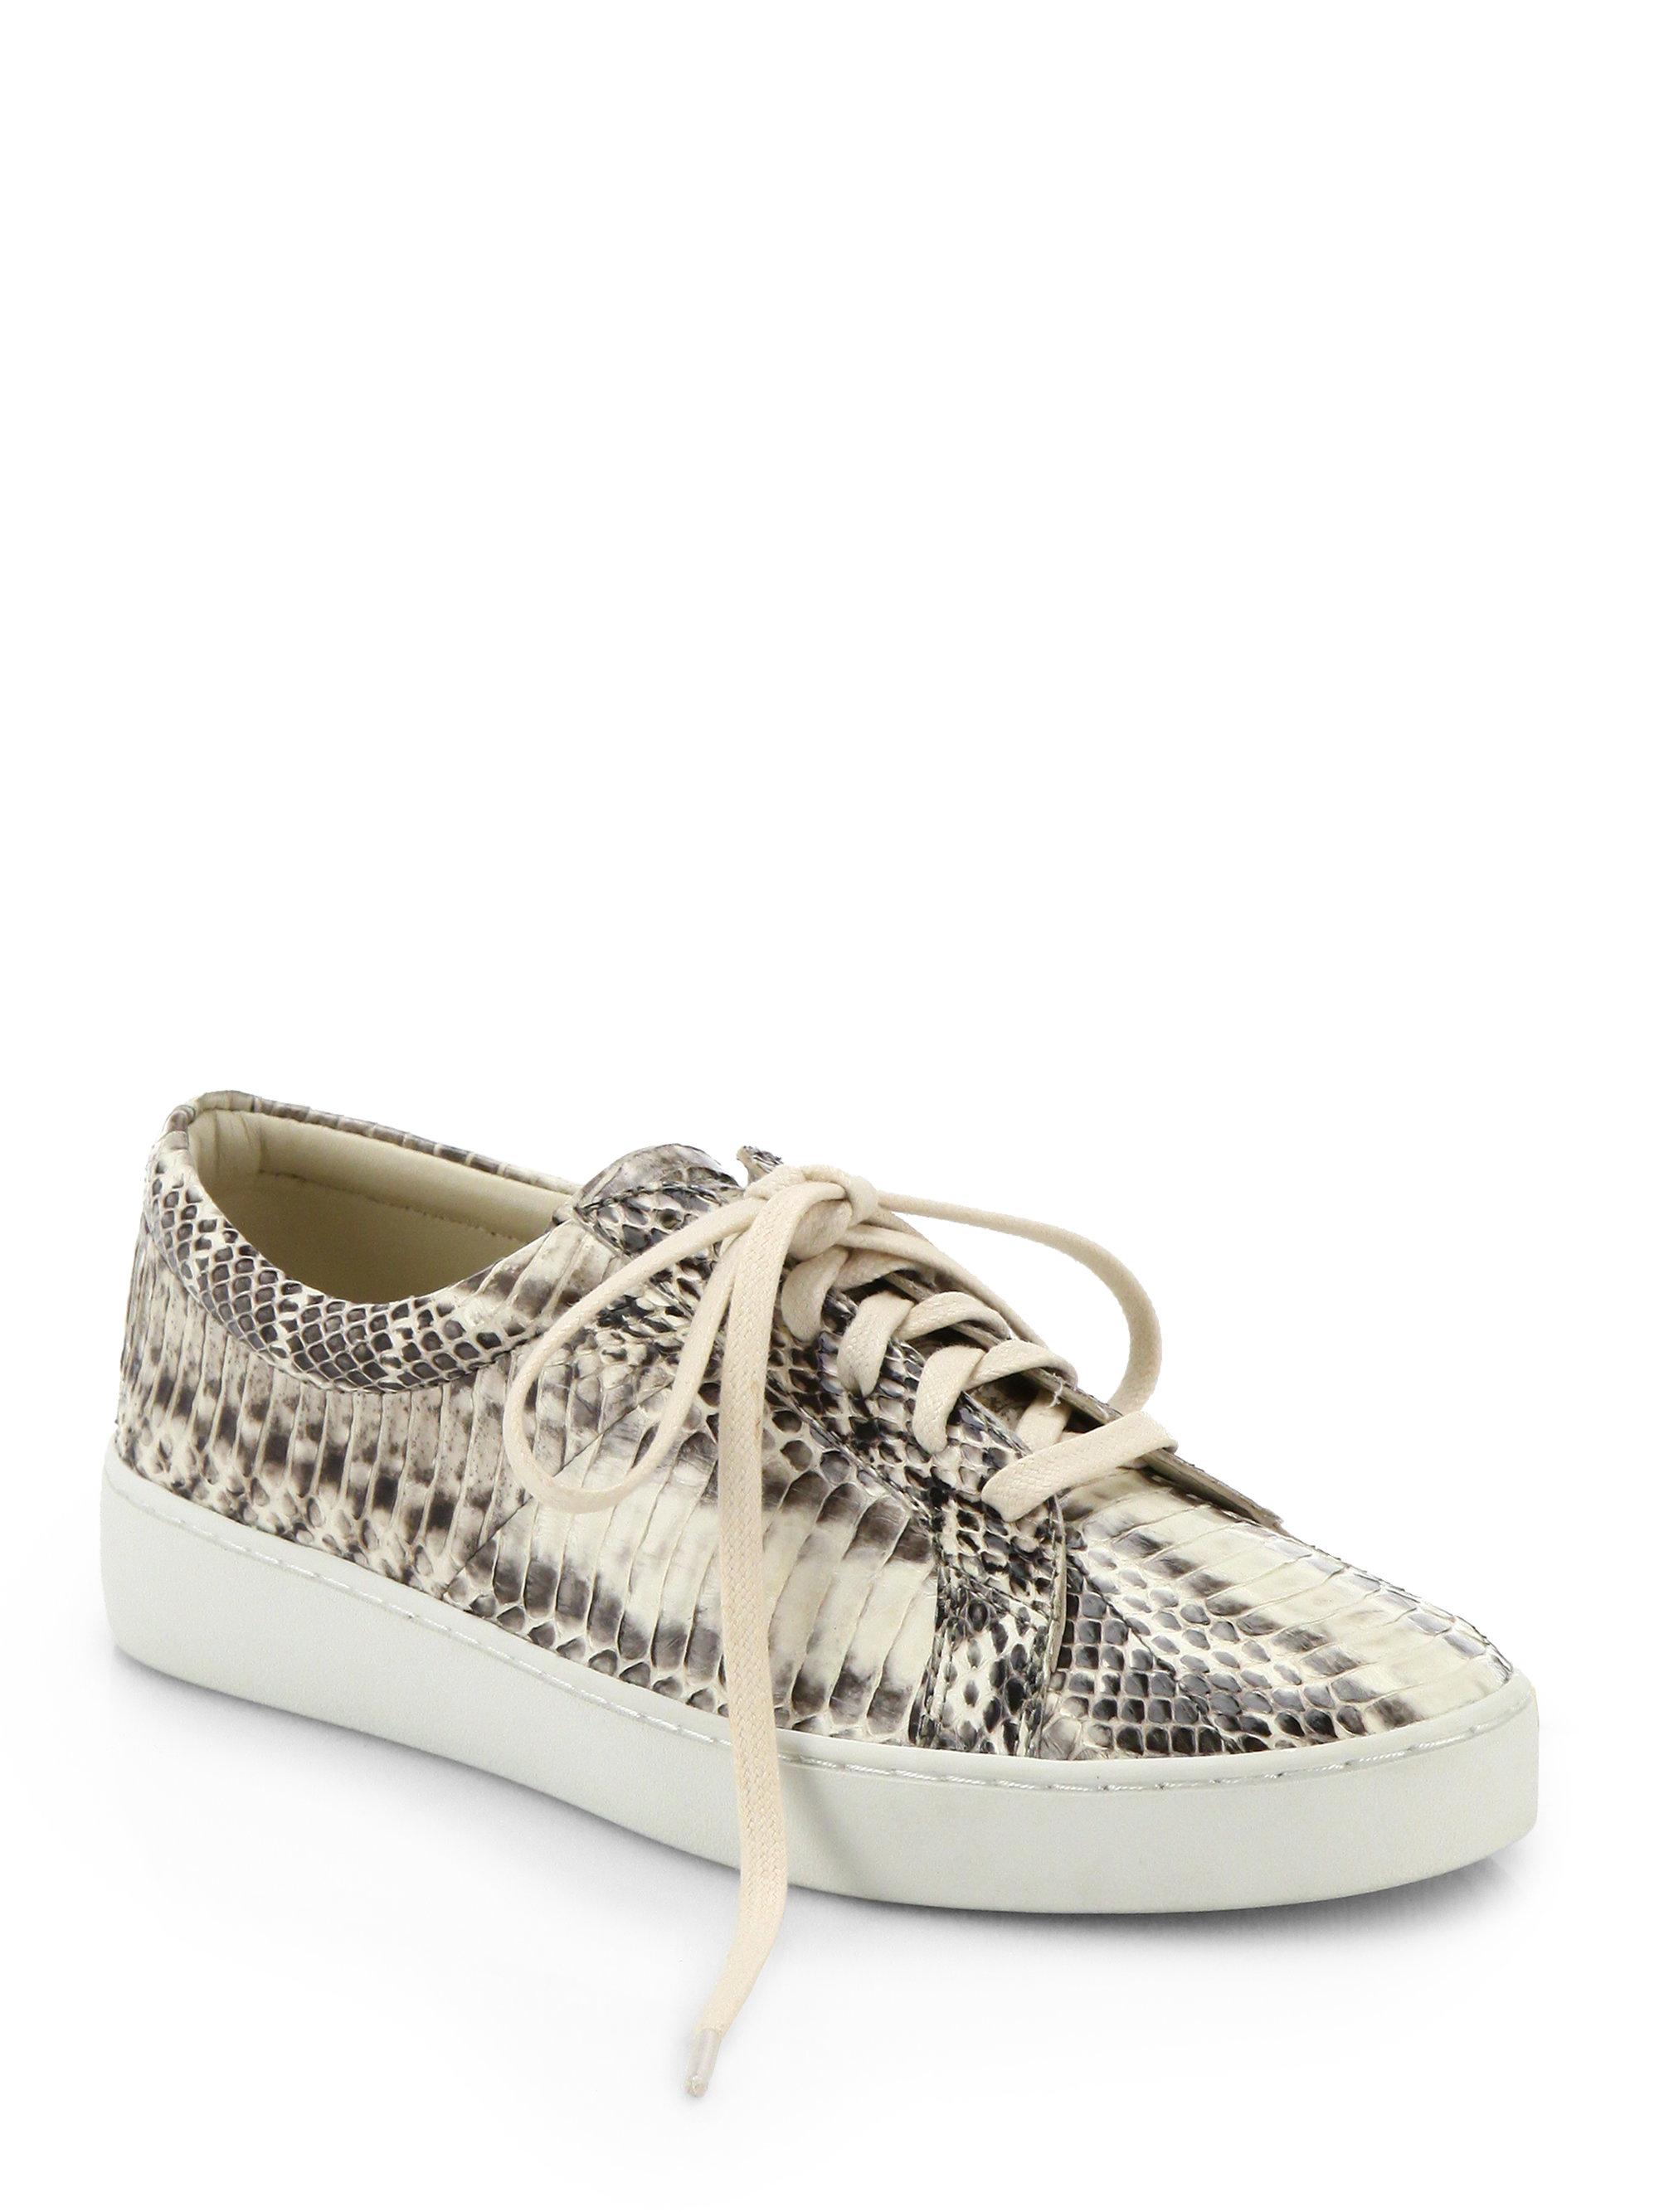 8c9545426f1 Michael Kors Valin Runway Snakeskin Lace-Up Sneakers in Natural - Lyst